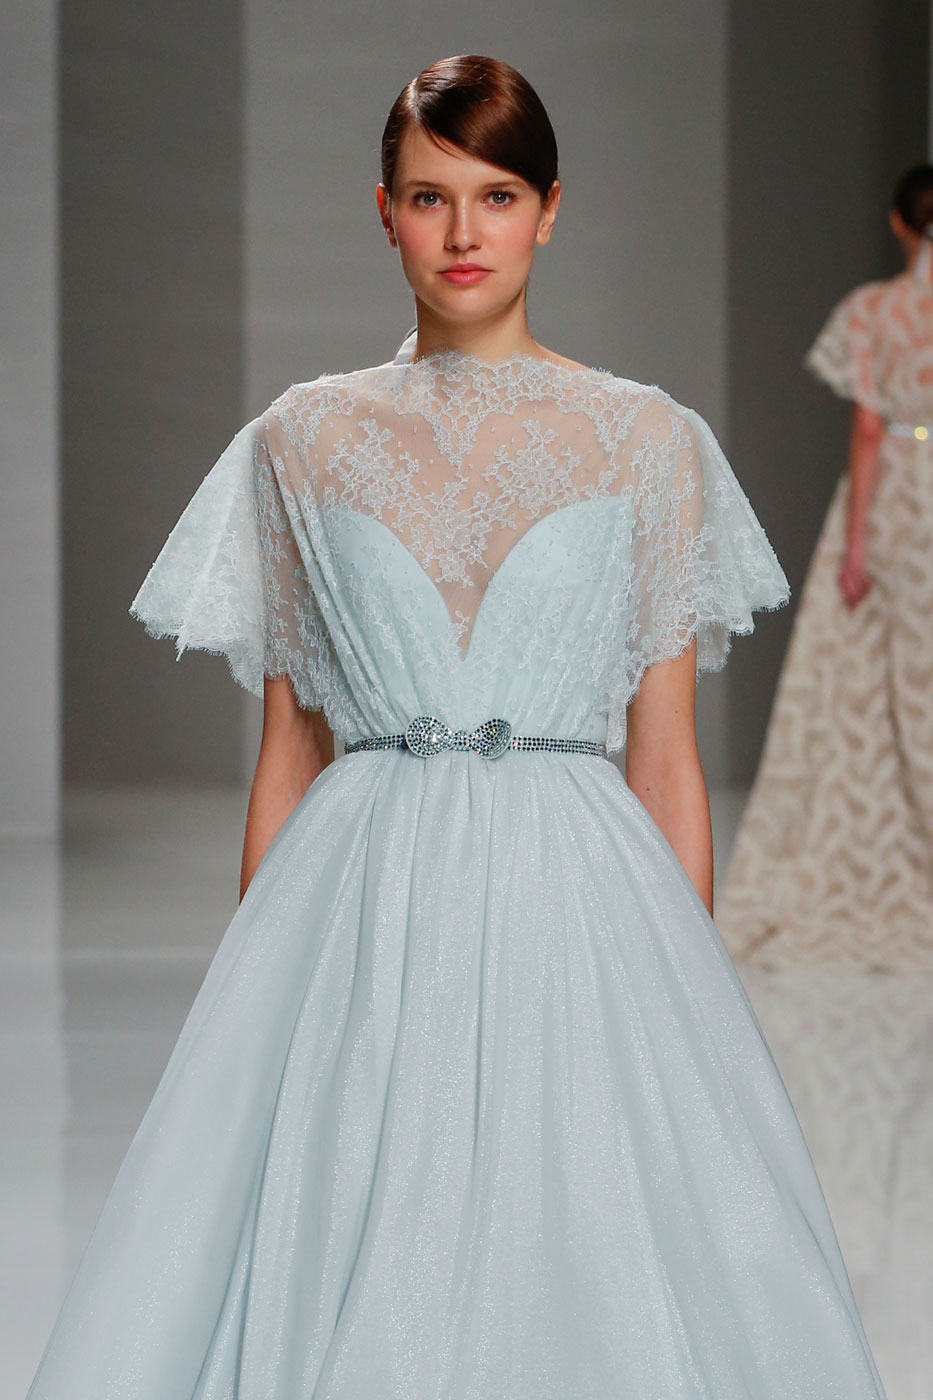 Georges-Hobeika-fashion-runway-show-haute-couture-paris-spring-2015-the-impression-62